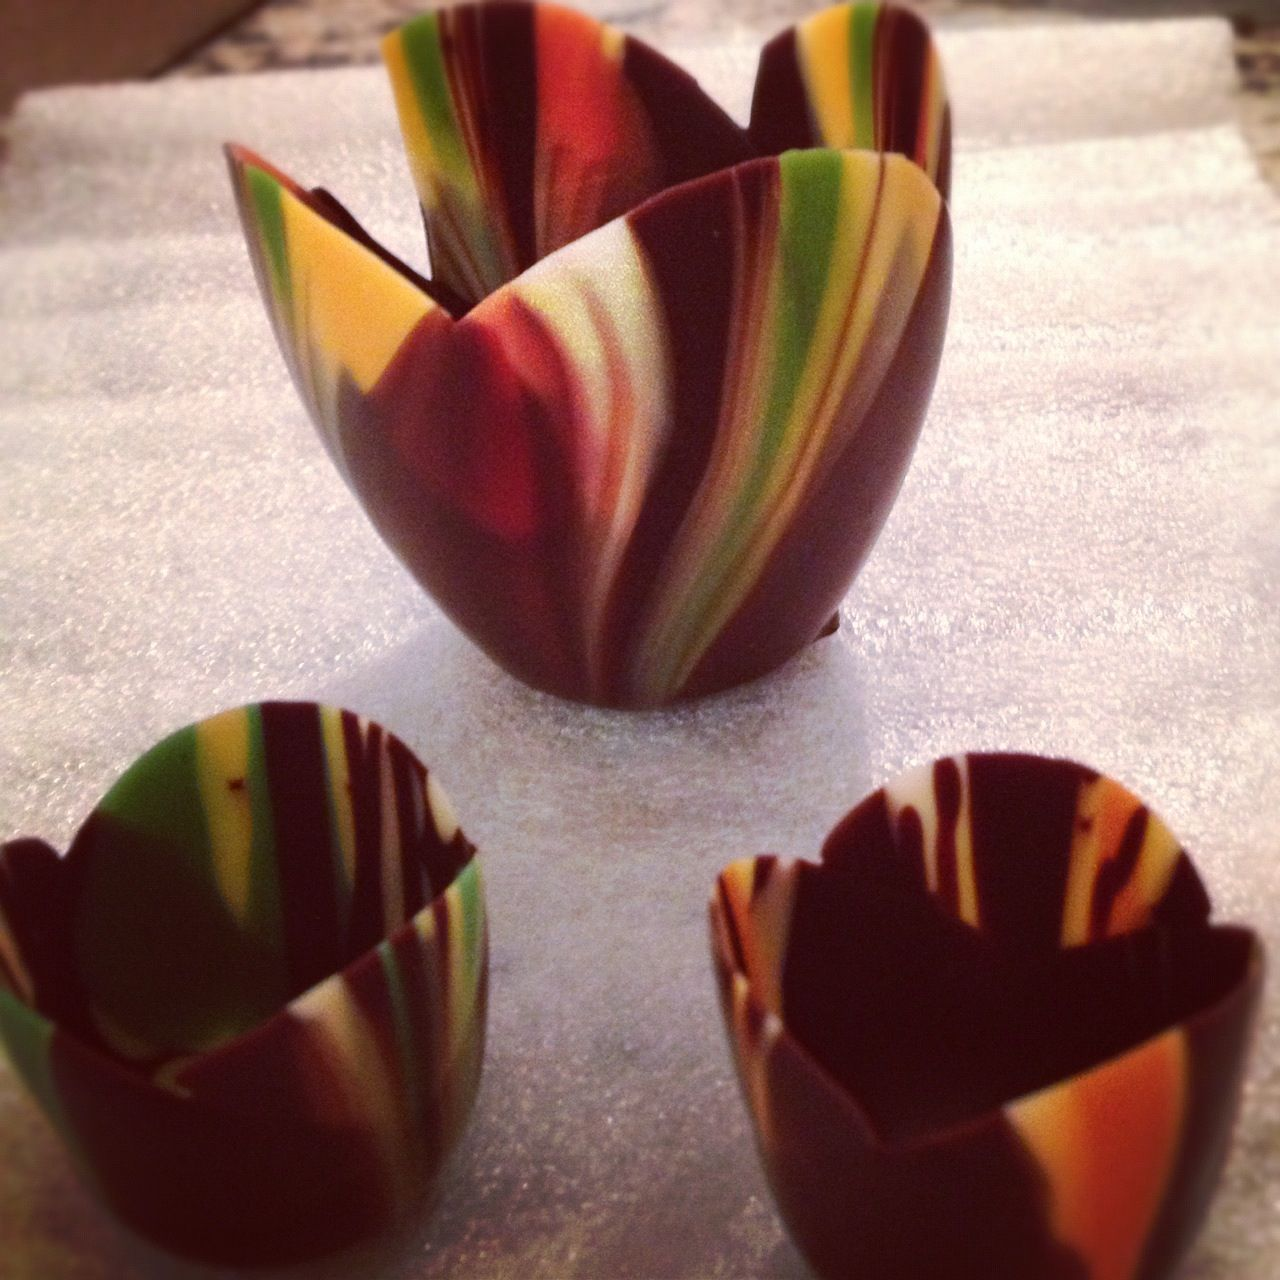 Artful chocolate dessert cups!   La maison   Pinterest